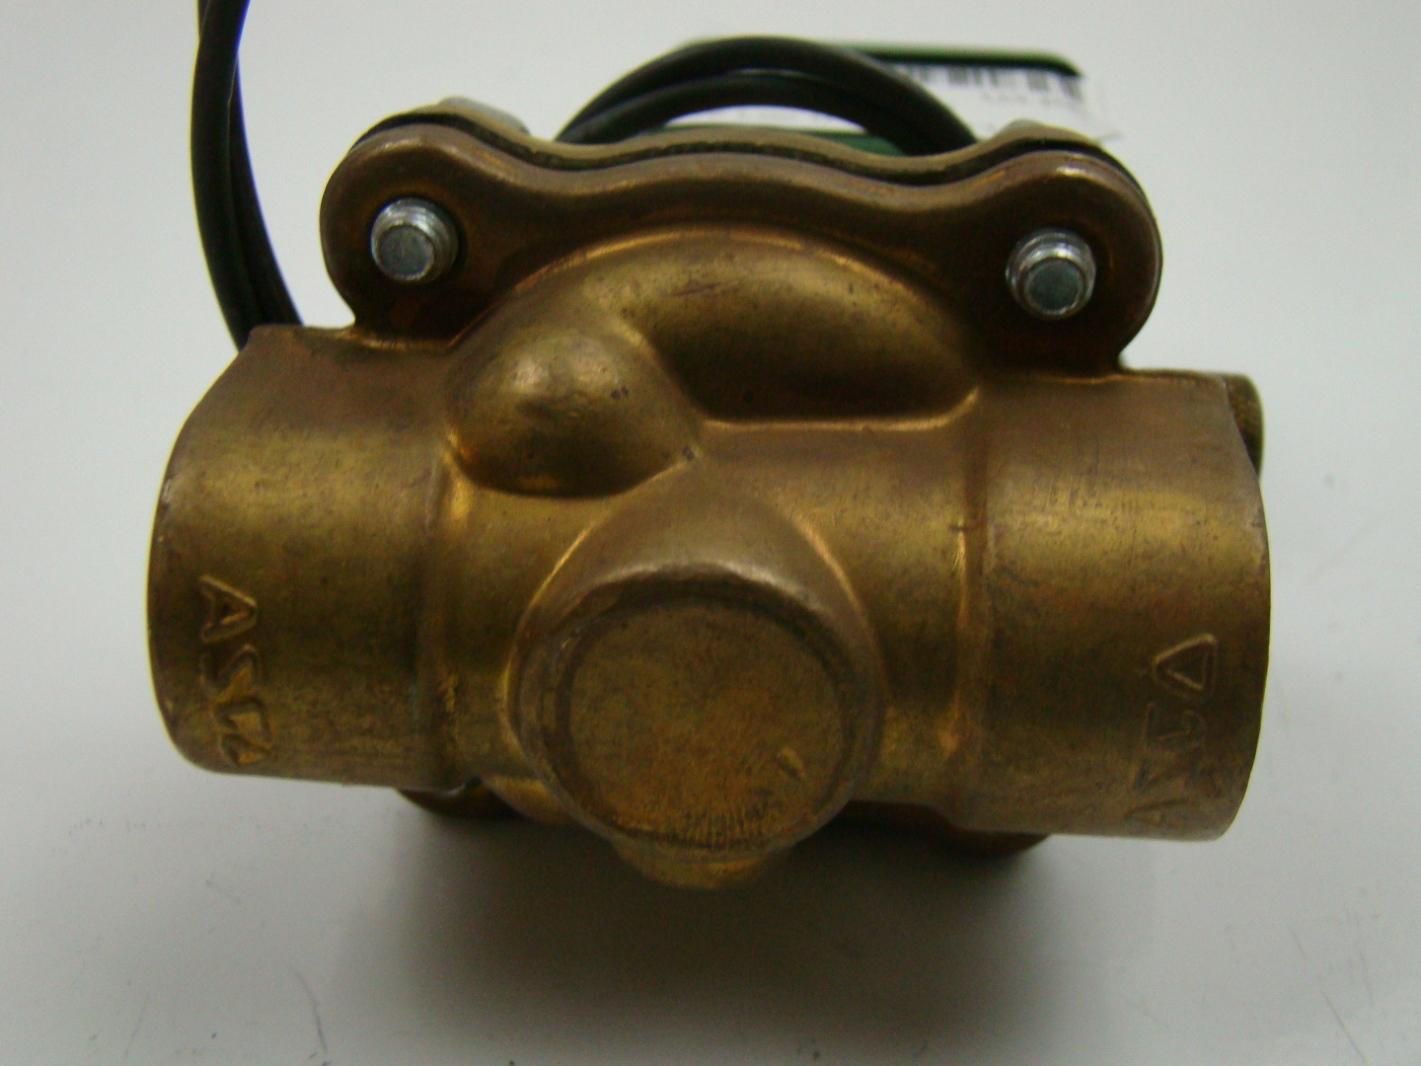 asco solenoid valve 8210 wiring diagram volvo 940 engine 2 way 1 quot 8210d2m0 ebay